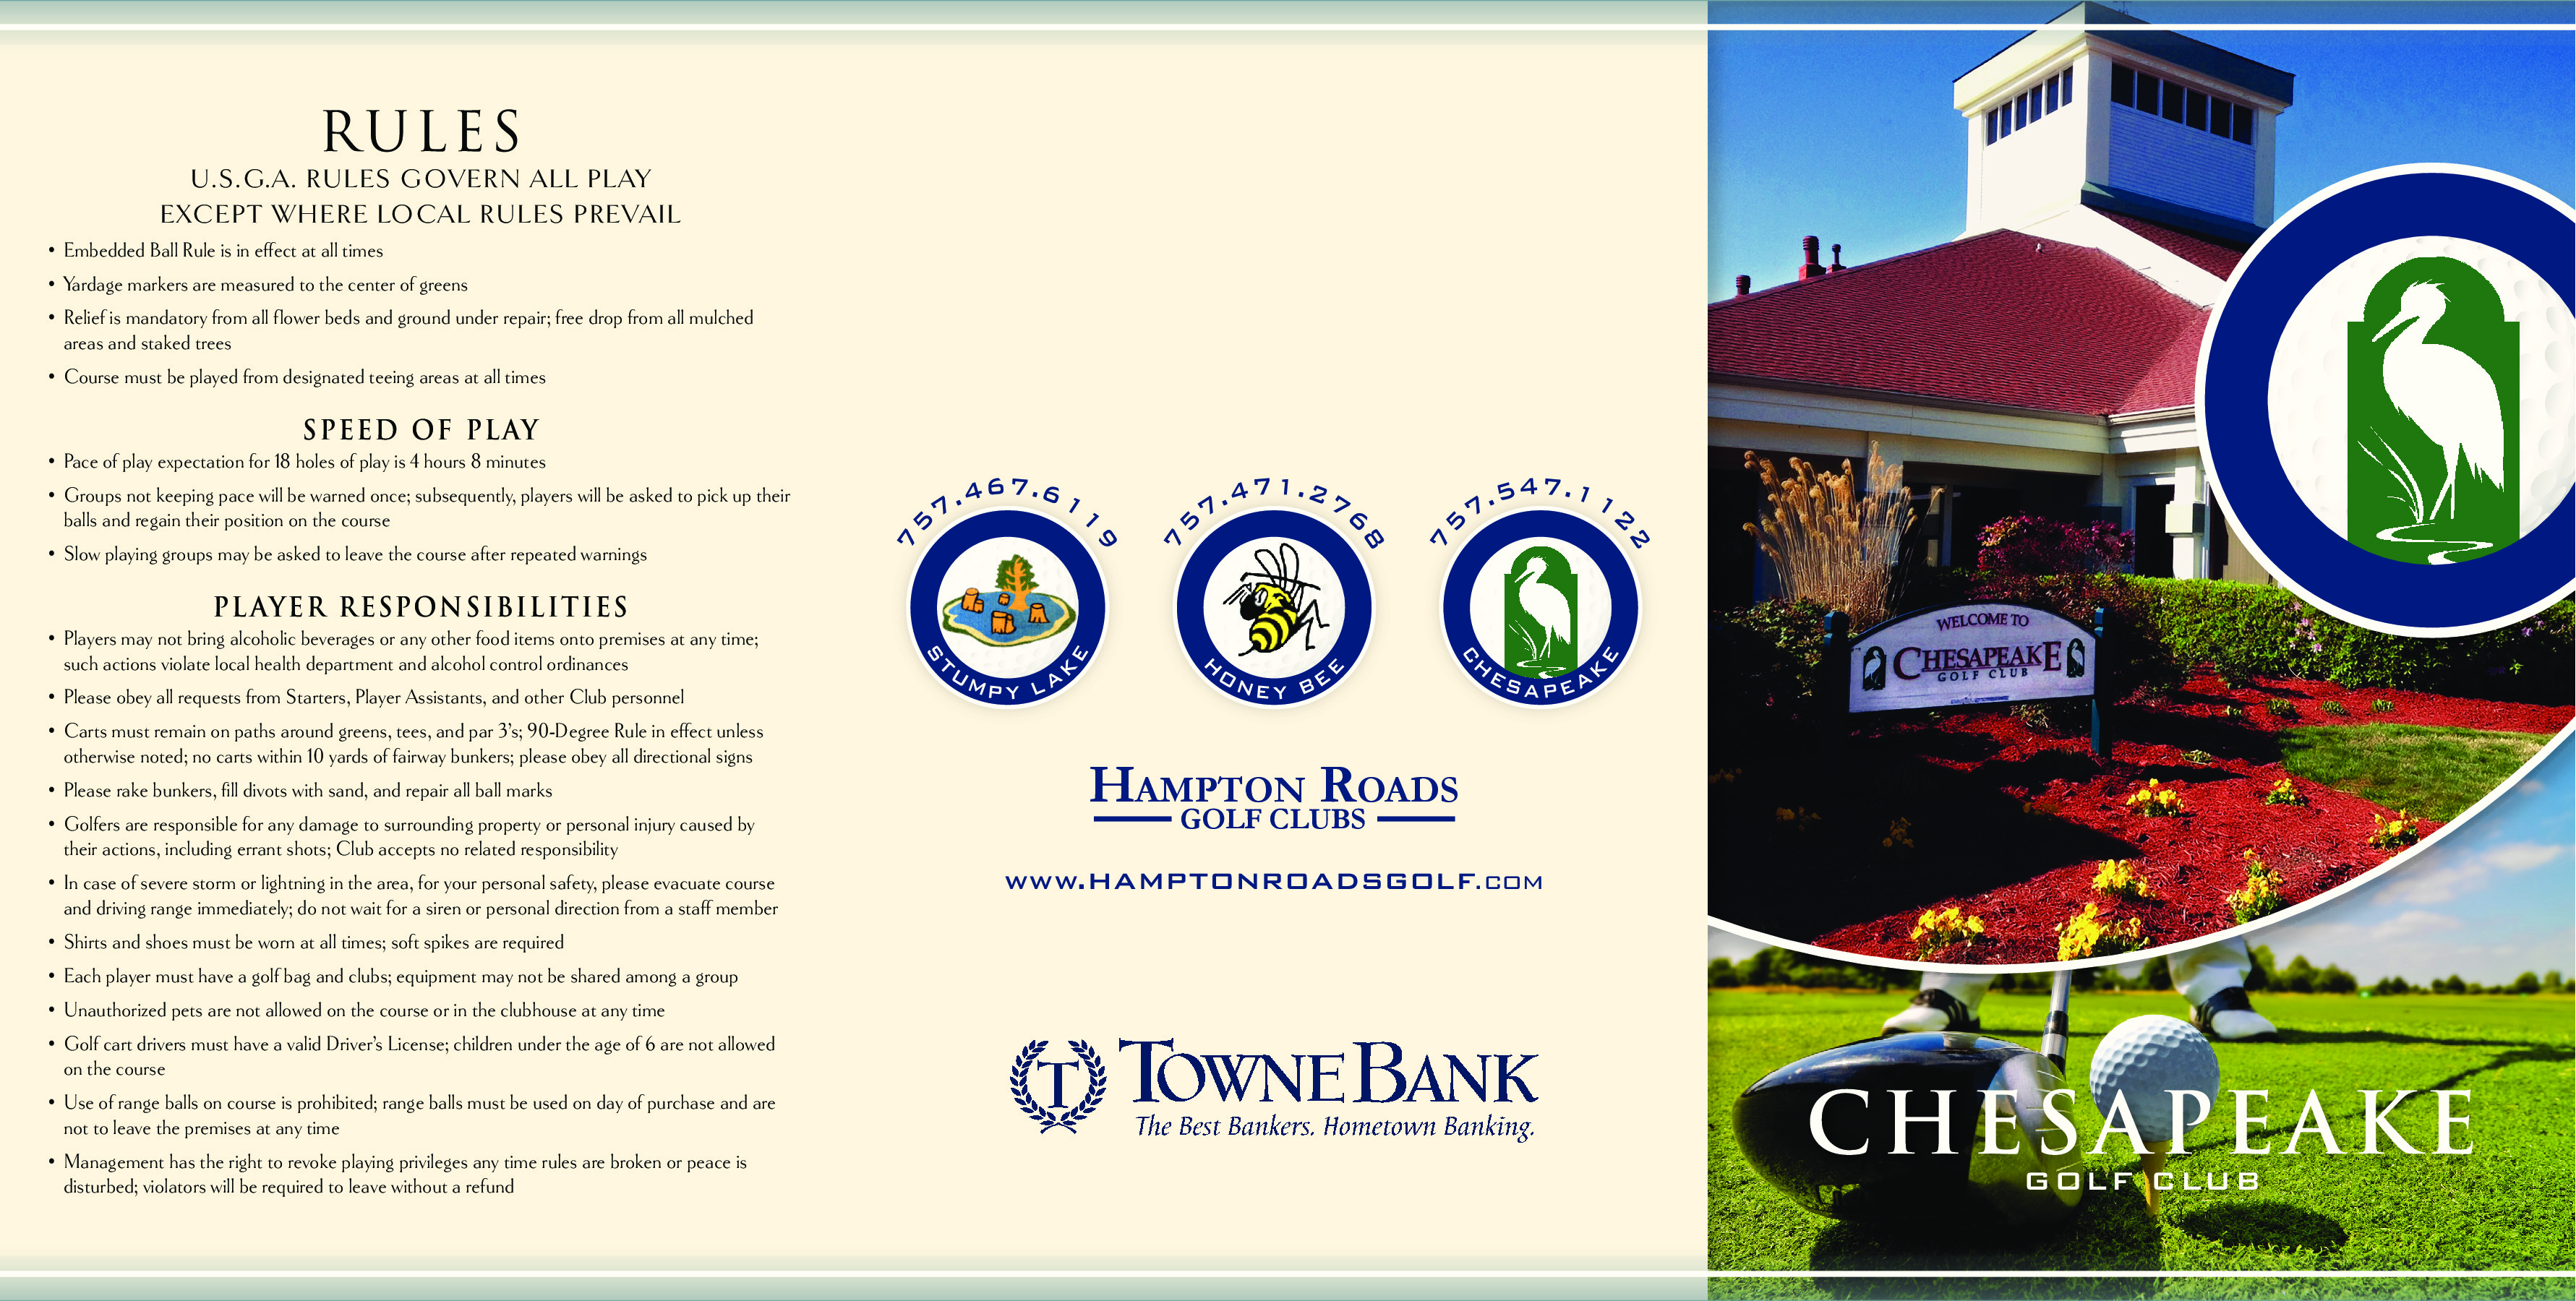 57090_Chesapeake_Scorecard_proof (1)-page-0